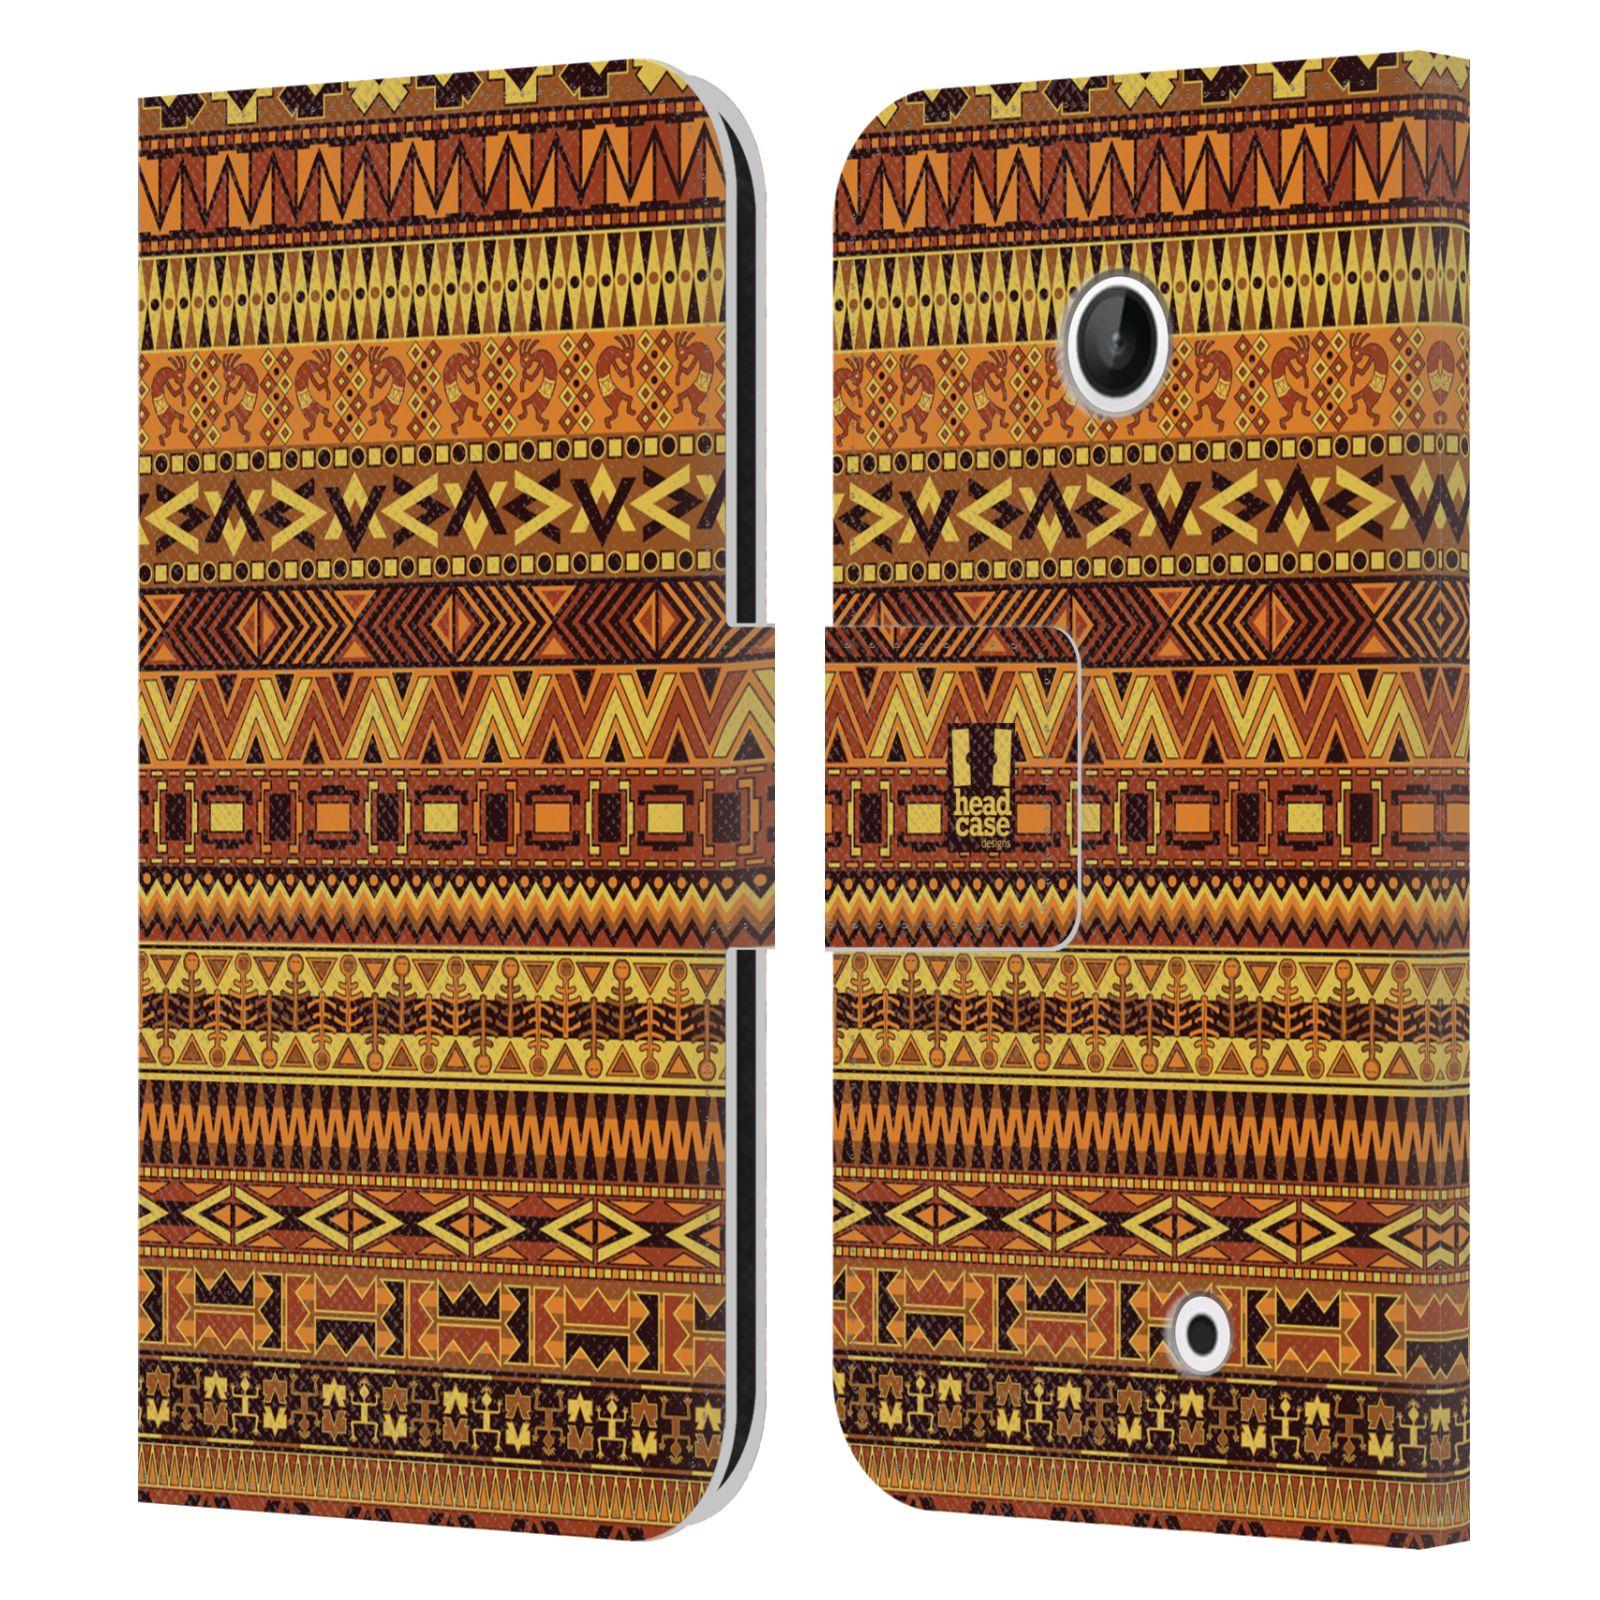 HEAD CASE Flipové pouzdro pro mobil NOKIA LUMIA 630 / LUMIA 630 DUAL Indiánský vzor YELLOW žlutá